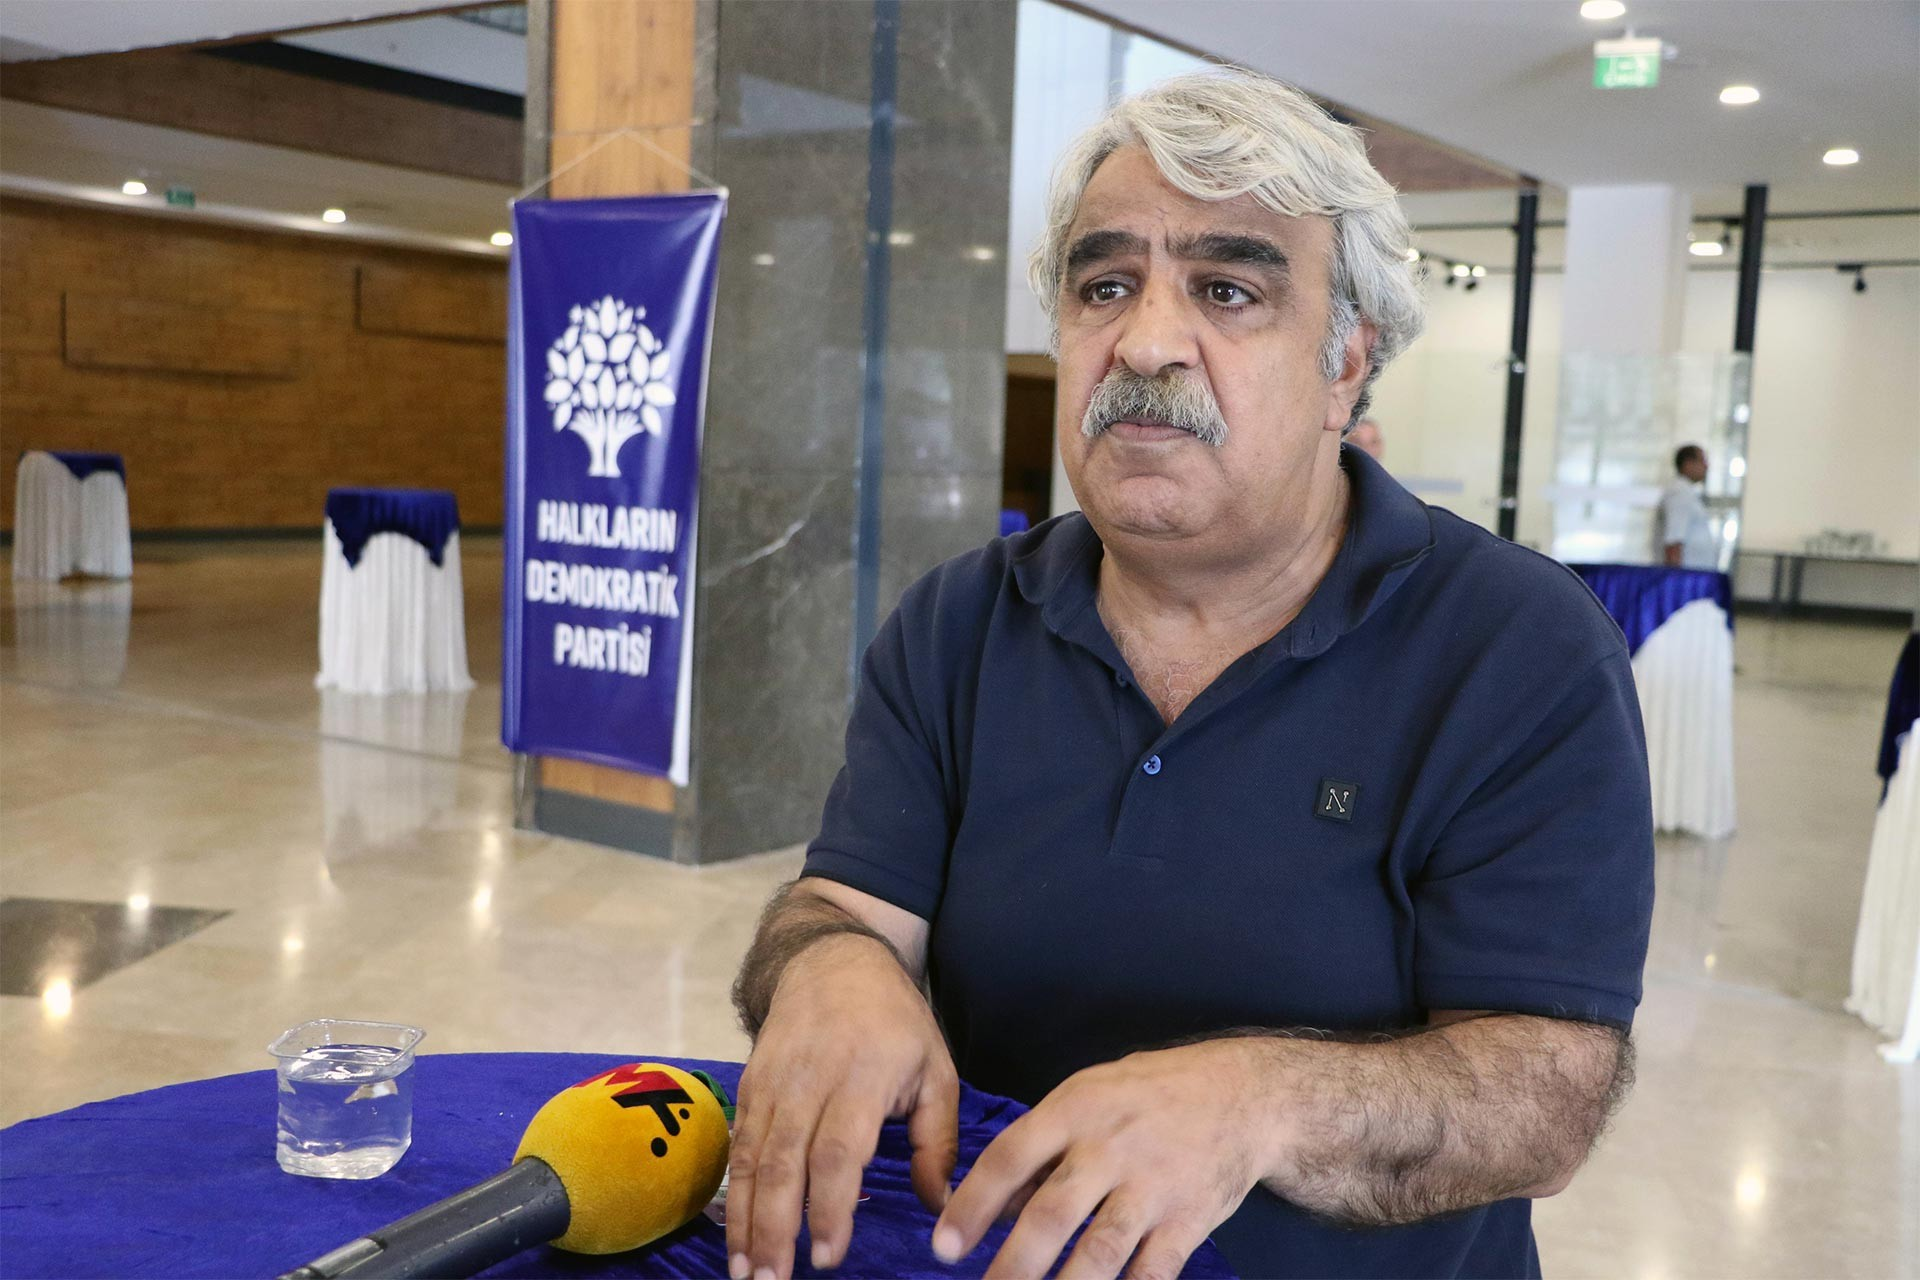 HDP'li Mithat Sancar: Bayram sonrası siyasi partilere anayasa çağrısı yapacağız